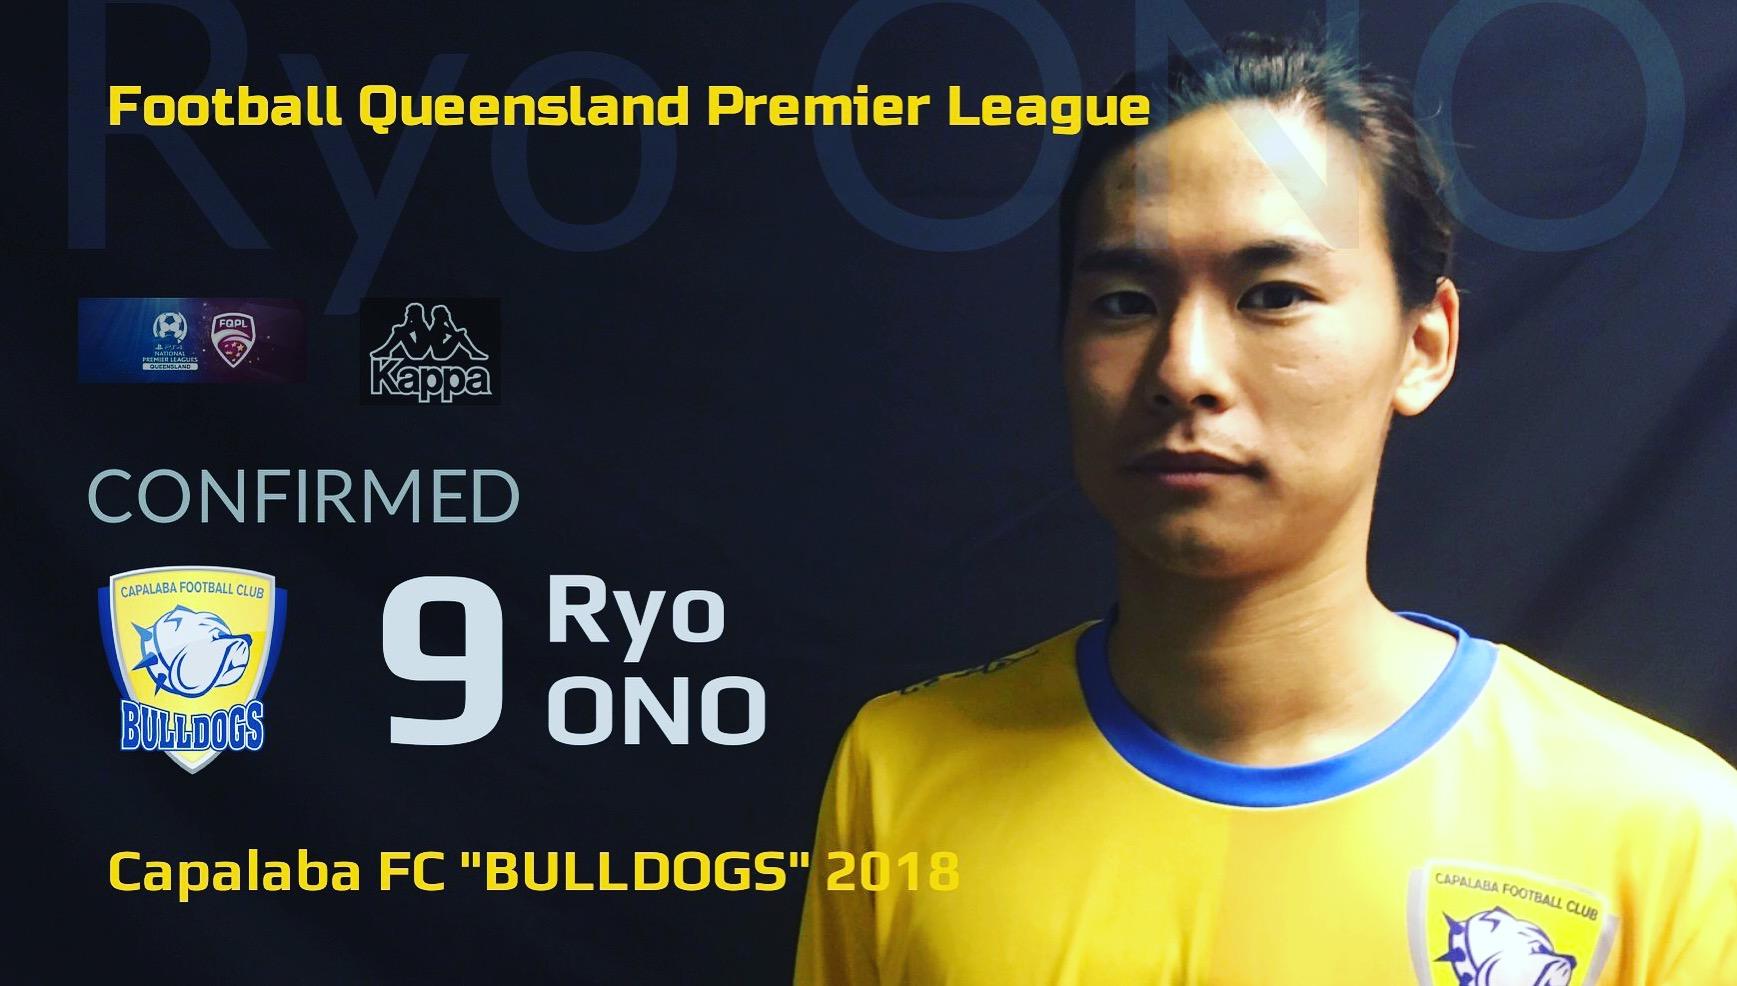 Ryo Ono Player Announcement.jpg